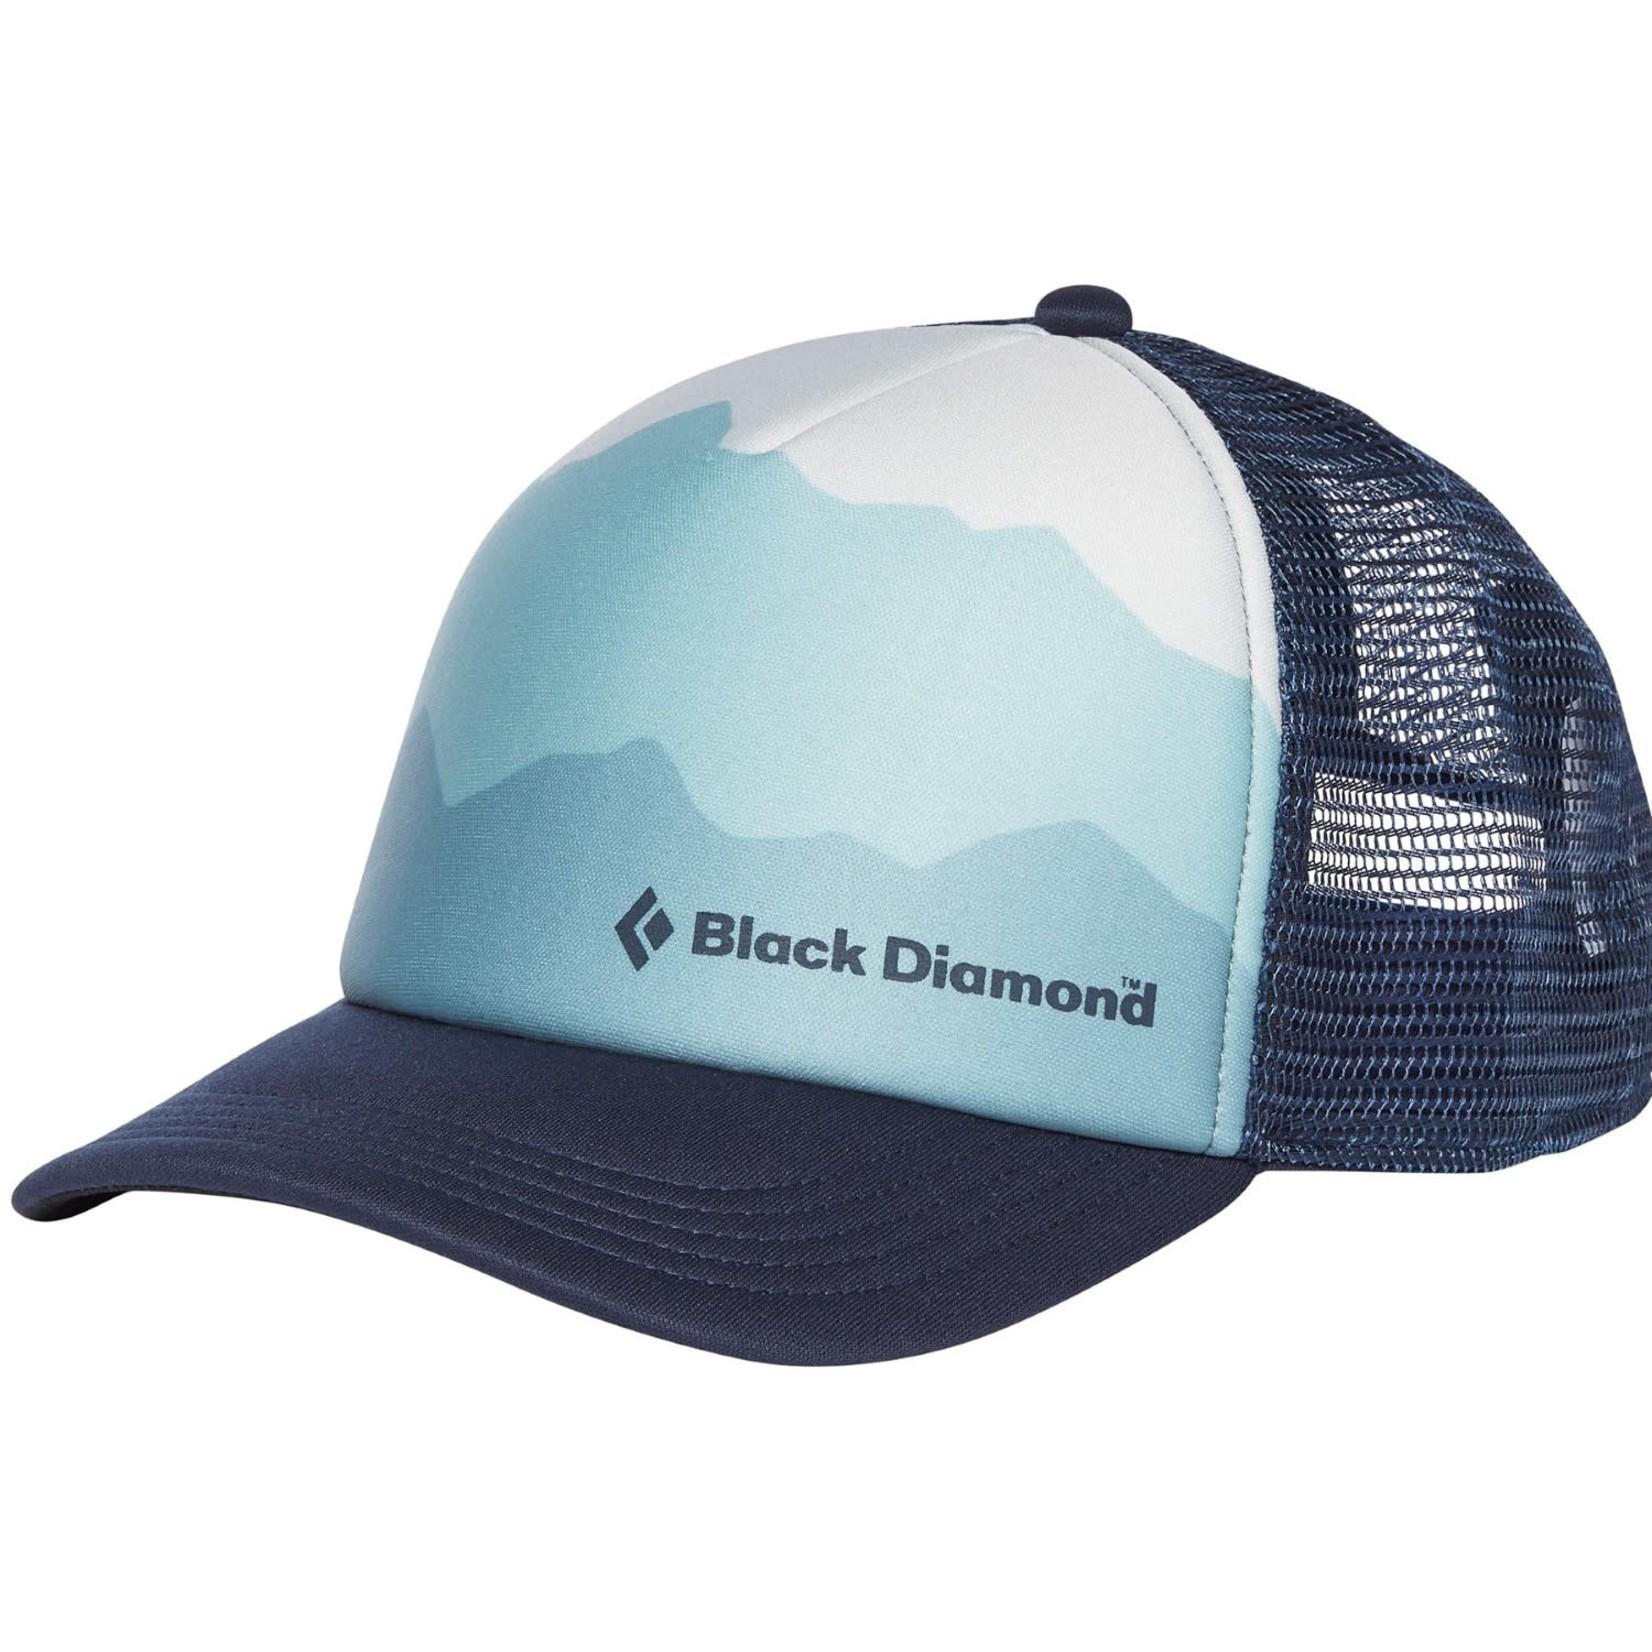 Black Diamond Casquette Black Diamond Trucker Hat - Femme